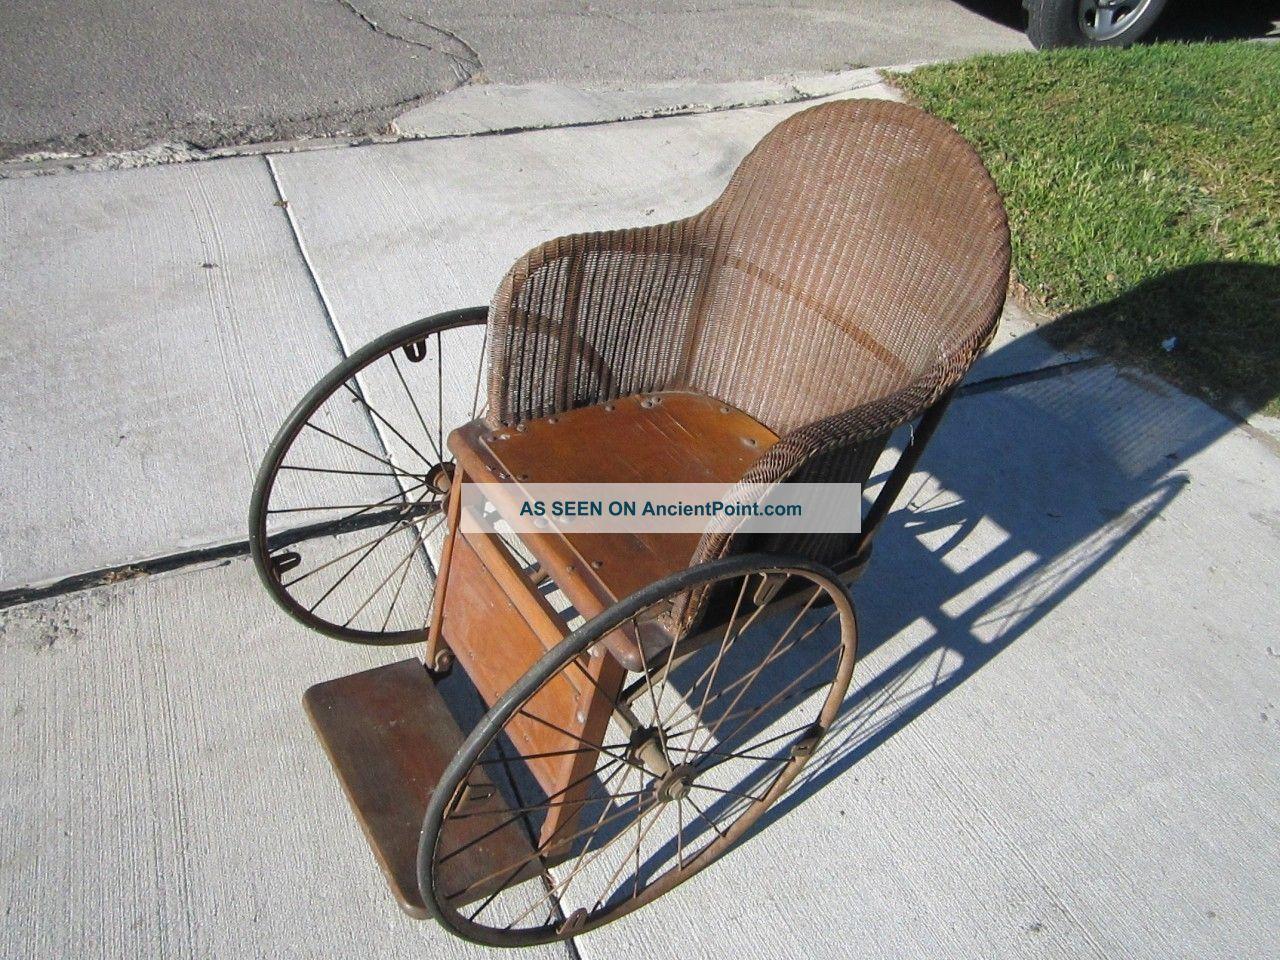 Vintage Gendron 3 Wheel Wheelchair Antique Wood & Wicker Wheelchair - Vintage Gendron 3 Wheel Wheelchair Antique Wood & Wicker